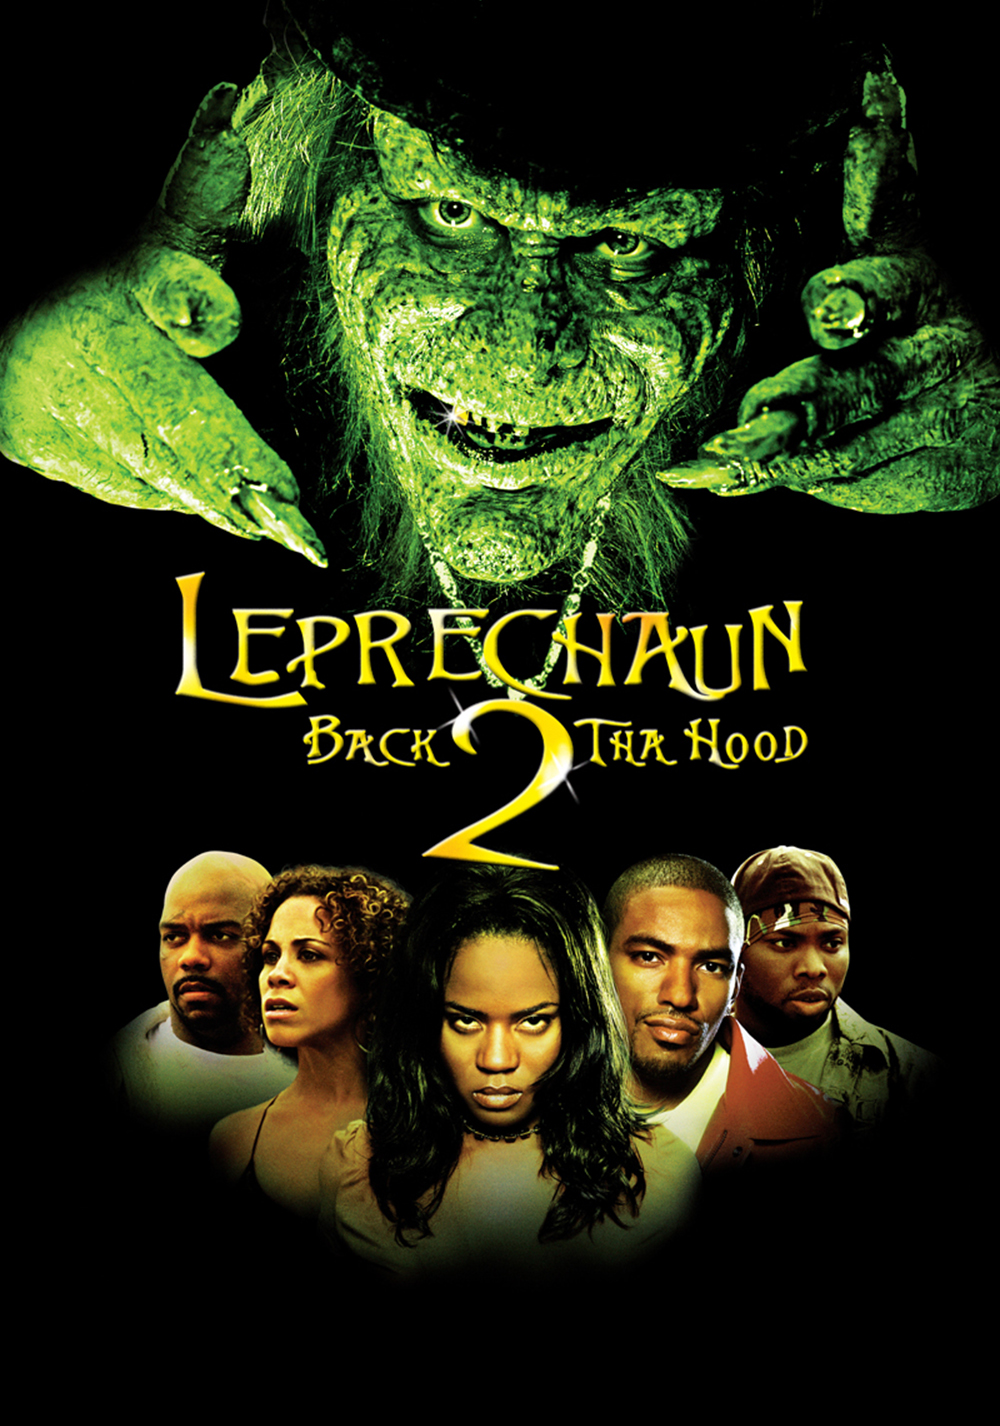 leprechaun back 2 tha hood movie fanart fanarttv